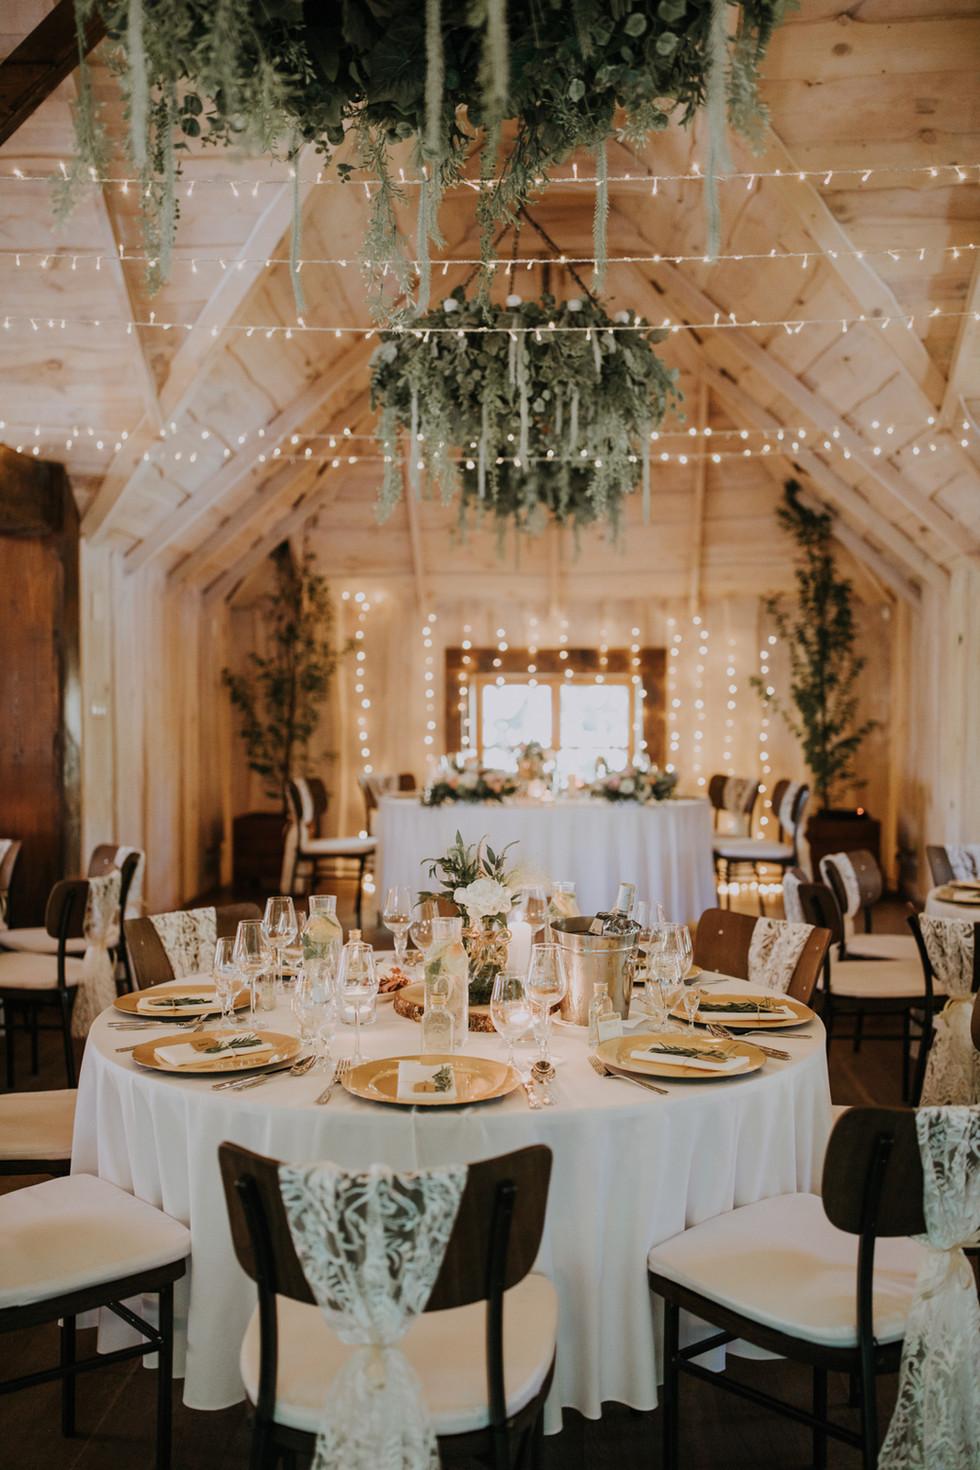 rustykalne wesele ogród babette, ogród babette rusiec, ślub w ogrodzie babette, wesele w ogrodzie babette, ogród babette, rustykalna sala weselna, wesele w plenerze